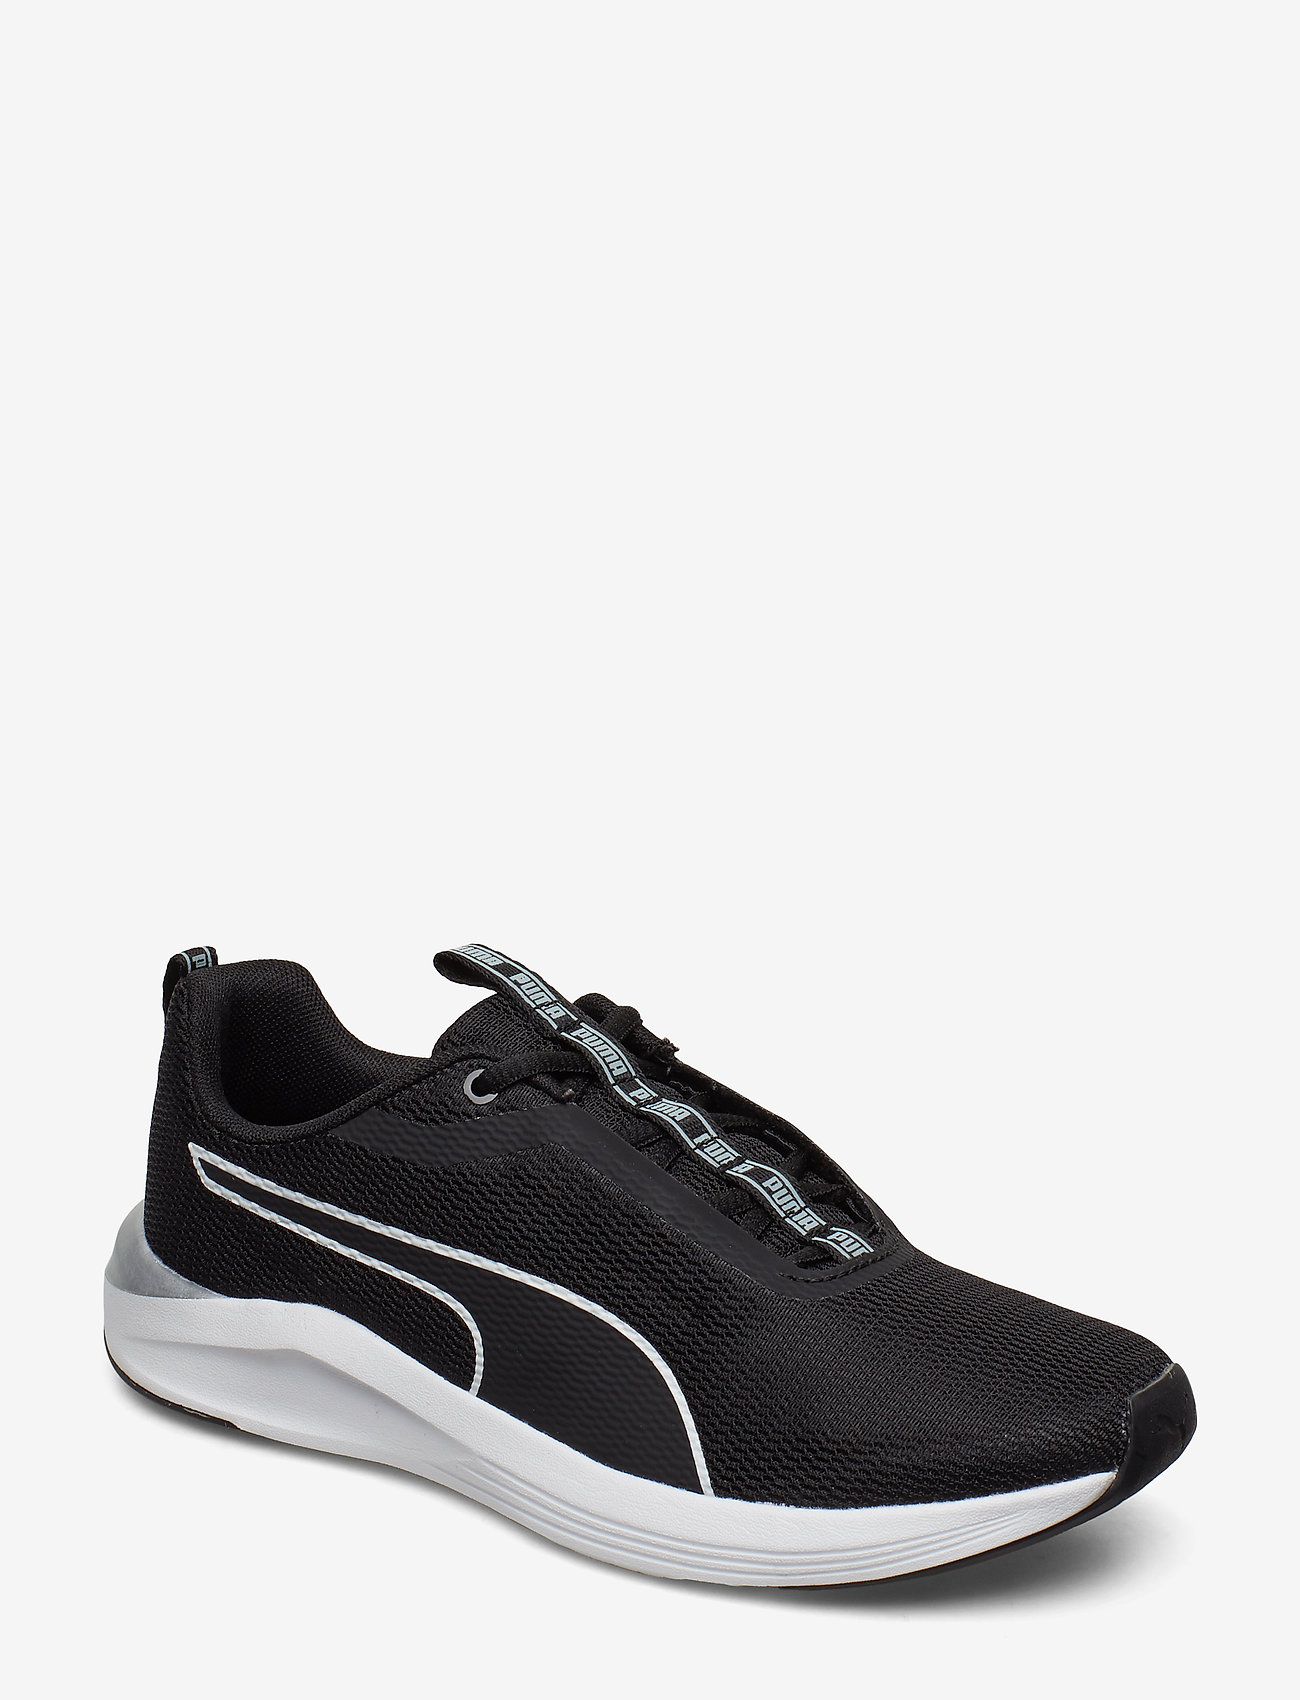 PUMA - Prowl 2 Wn's - training shoes - puma black-puma white - 0